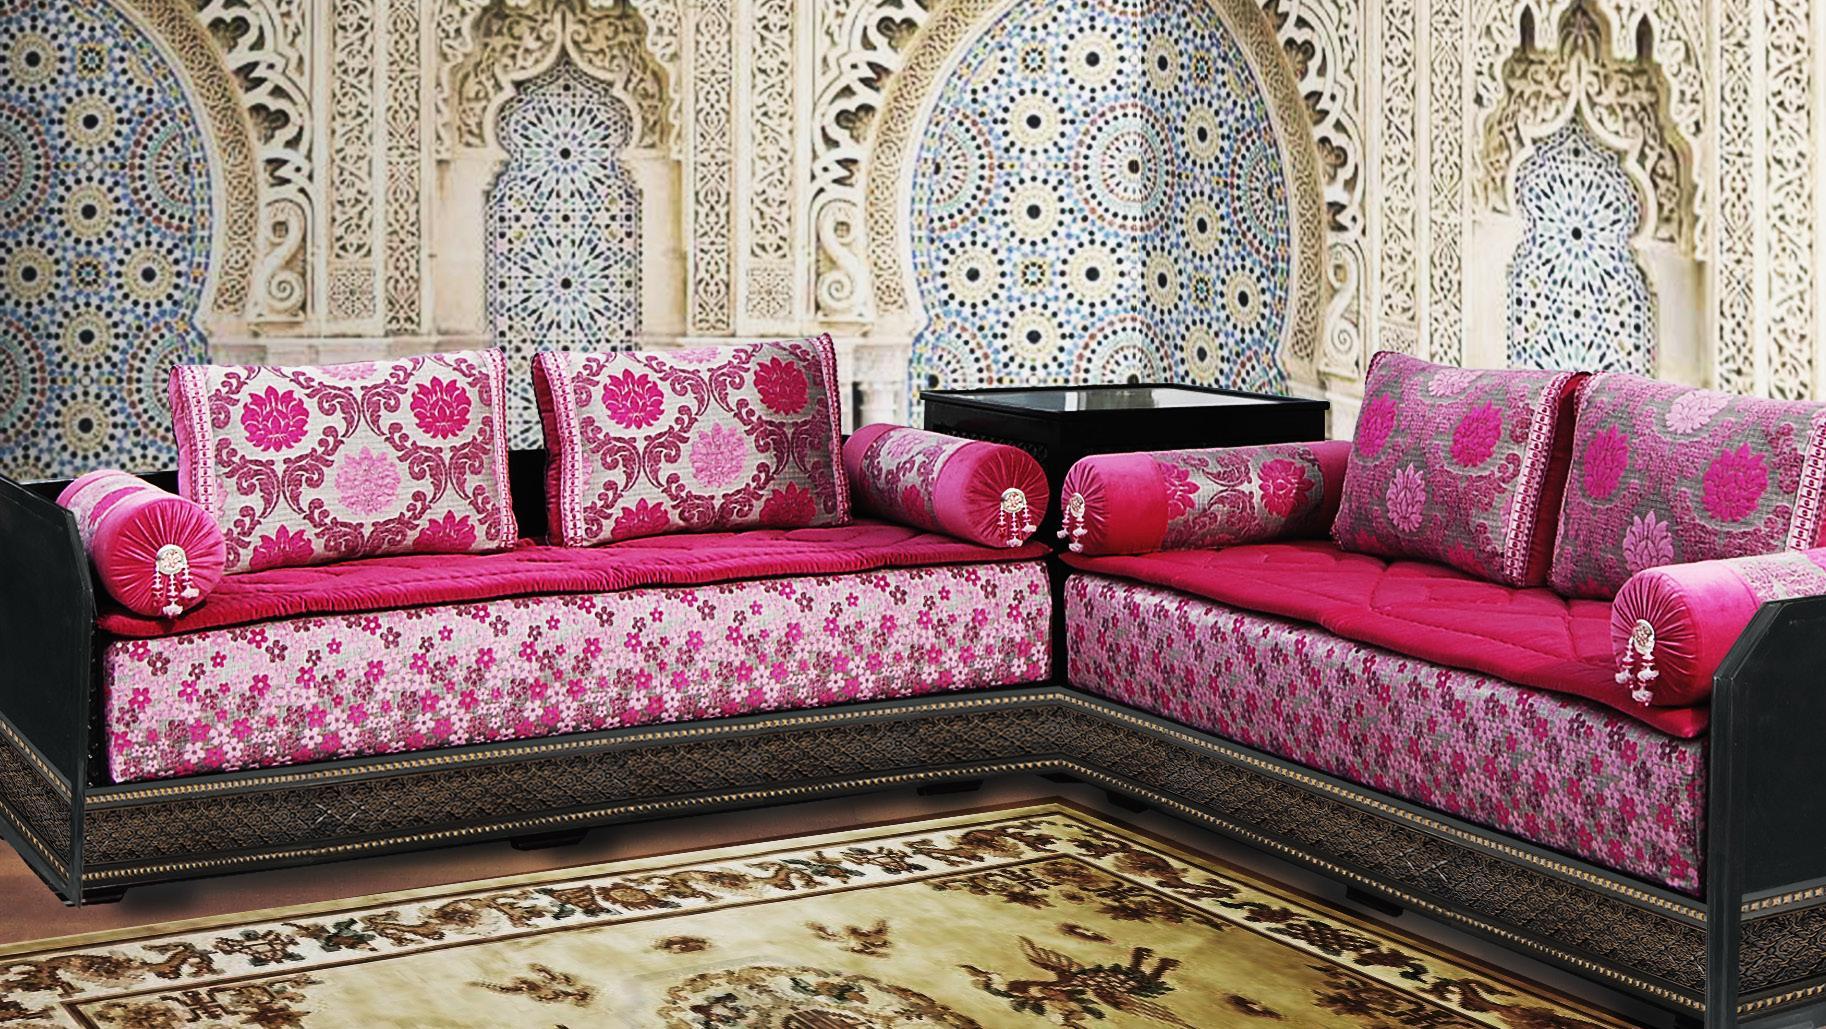 matelas pour sedari pas cher cheap magasin with matelas. Black Bedroom Furniture Sets. Home Design Ideas